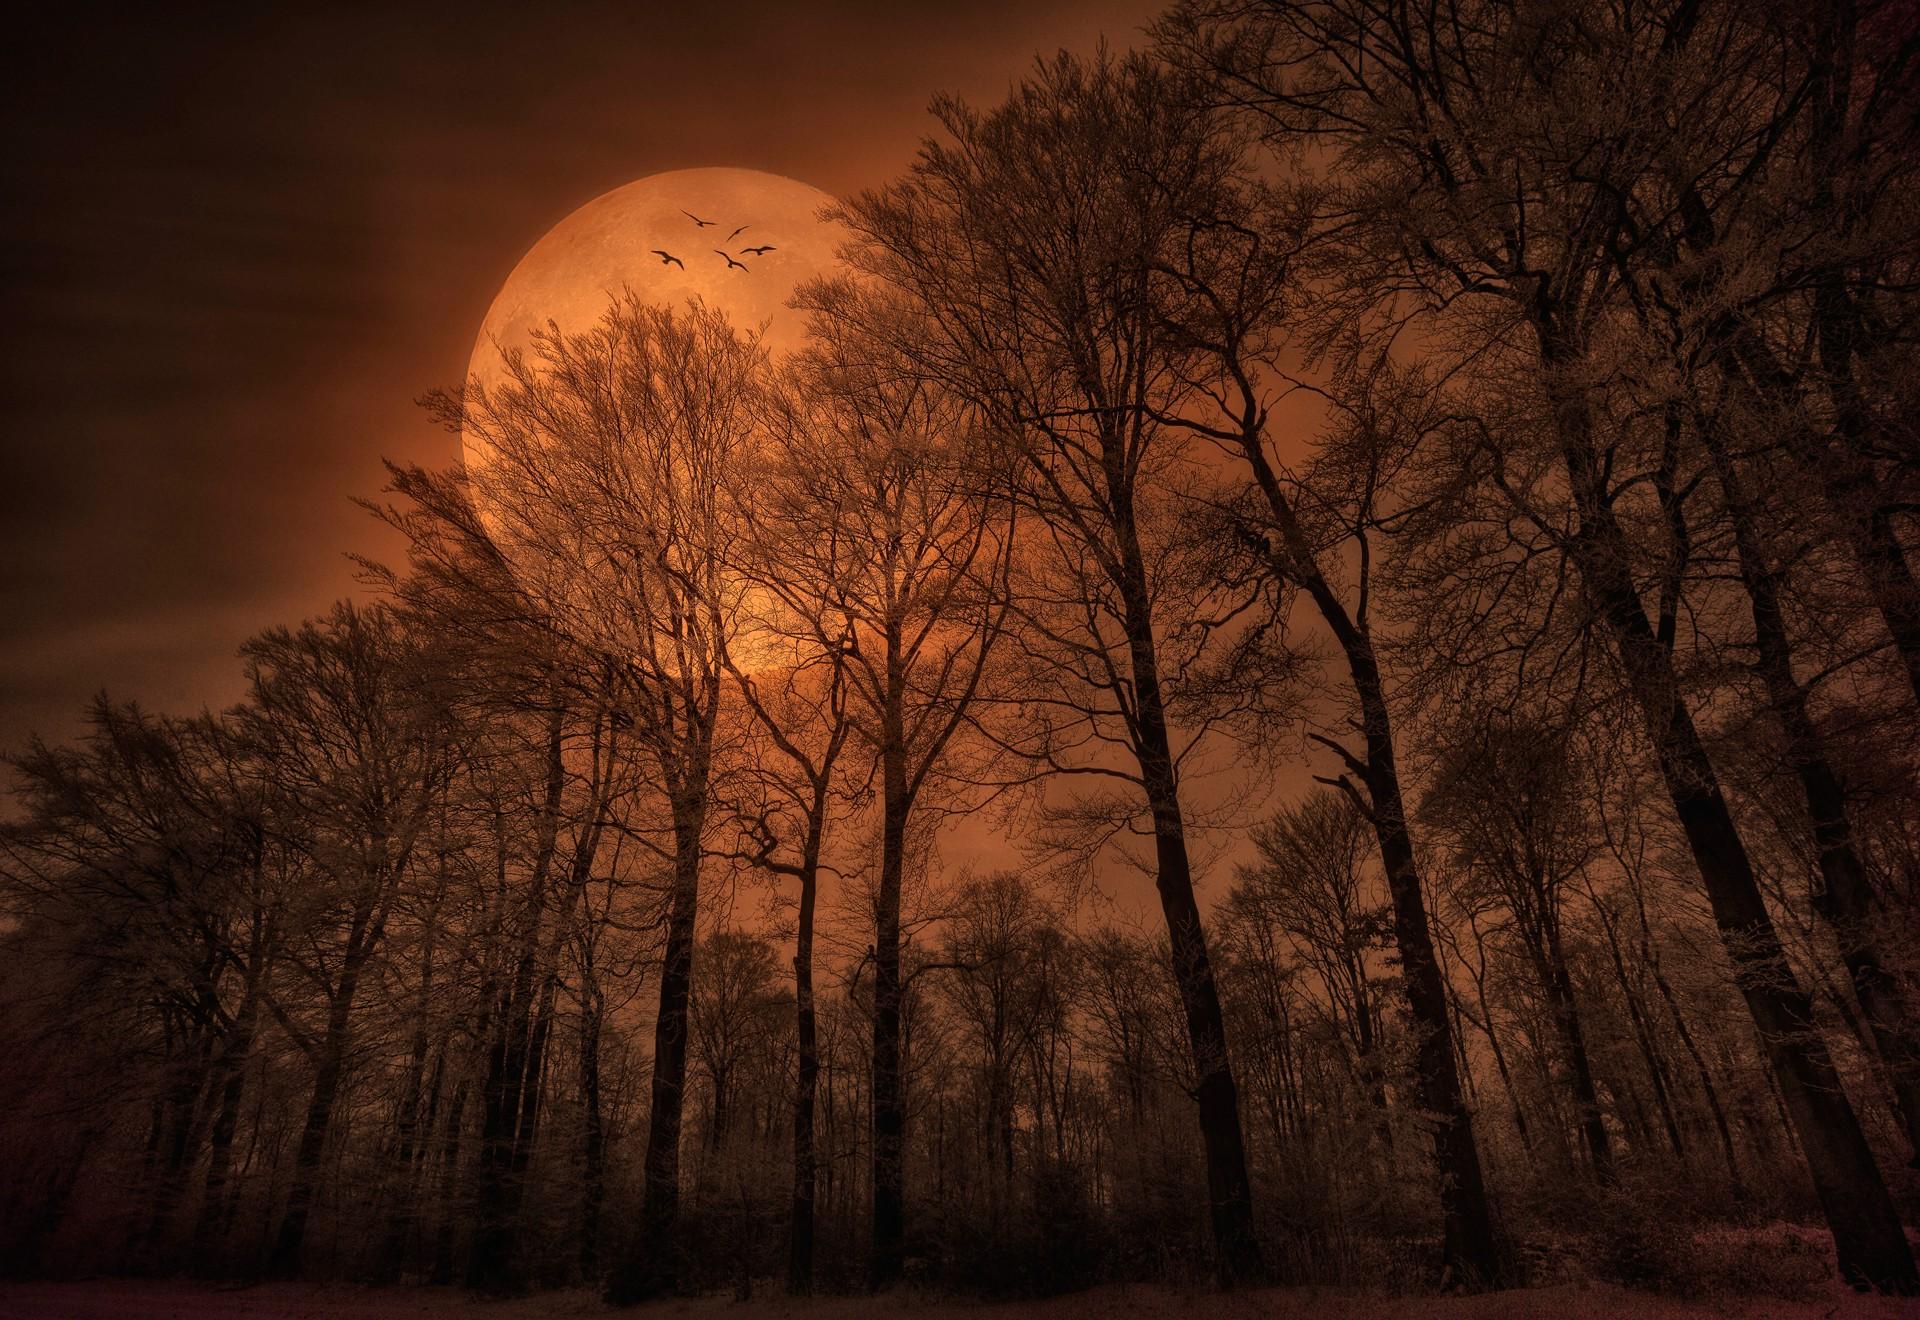 Sunlight Trees Forest Monochrome Sunset Night Nature Spooky Branch Sunrise Moon Evening Morning Mist Atmosphere Dusk